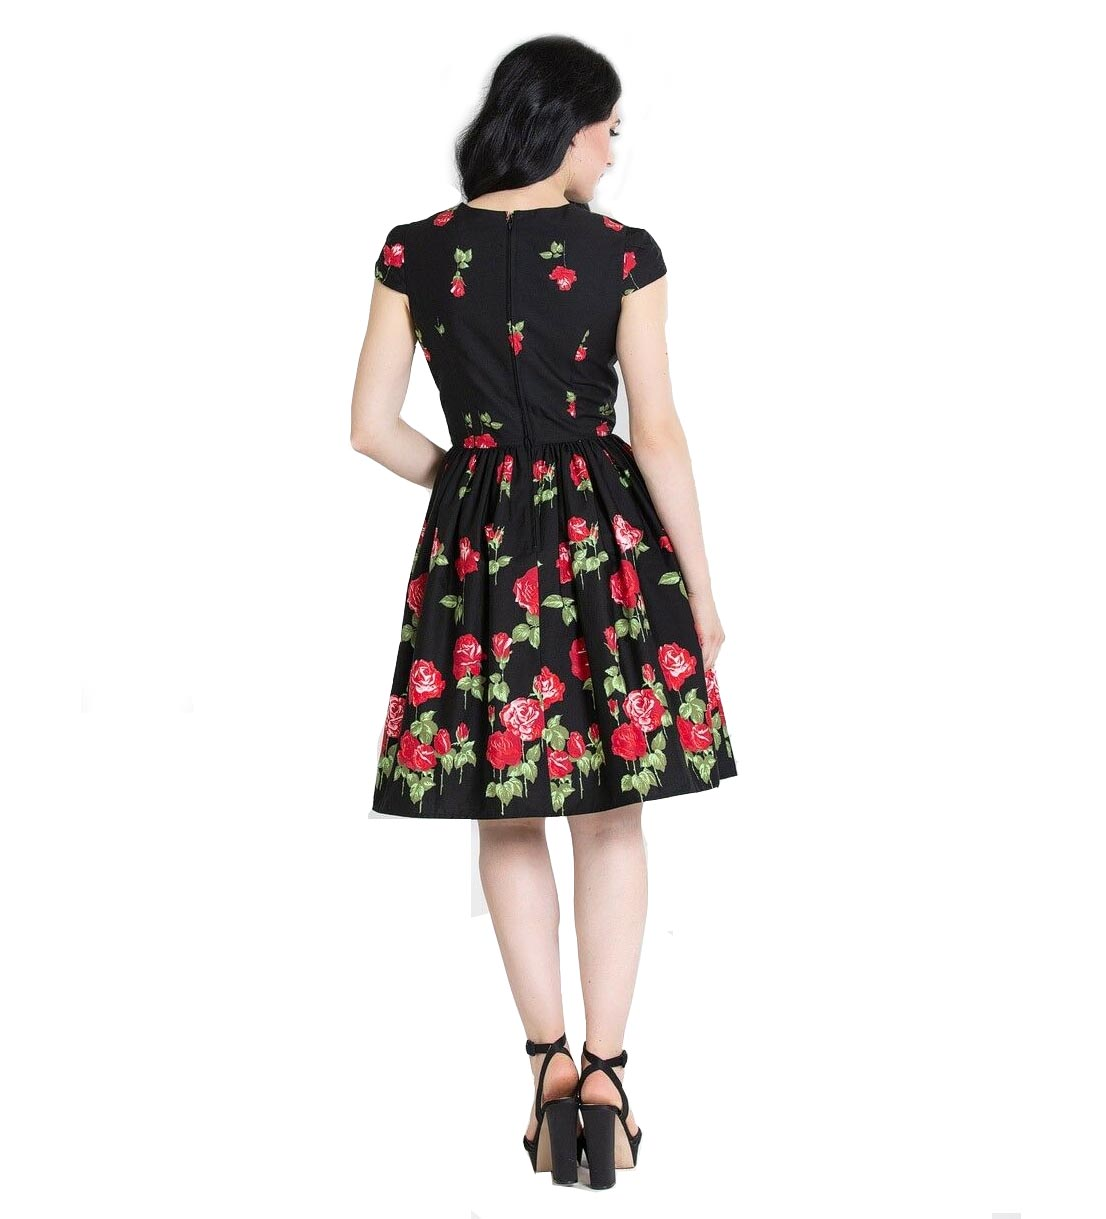 Hell-Bunny-Pin-Up-Mid-Length-50s-Dress-ANTONIA-Rose-Floral-Black thumbnail 9